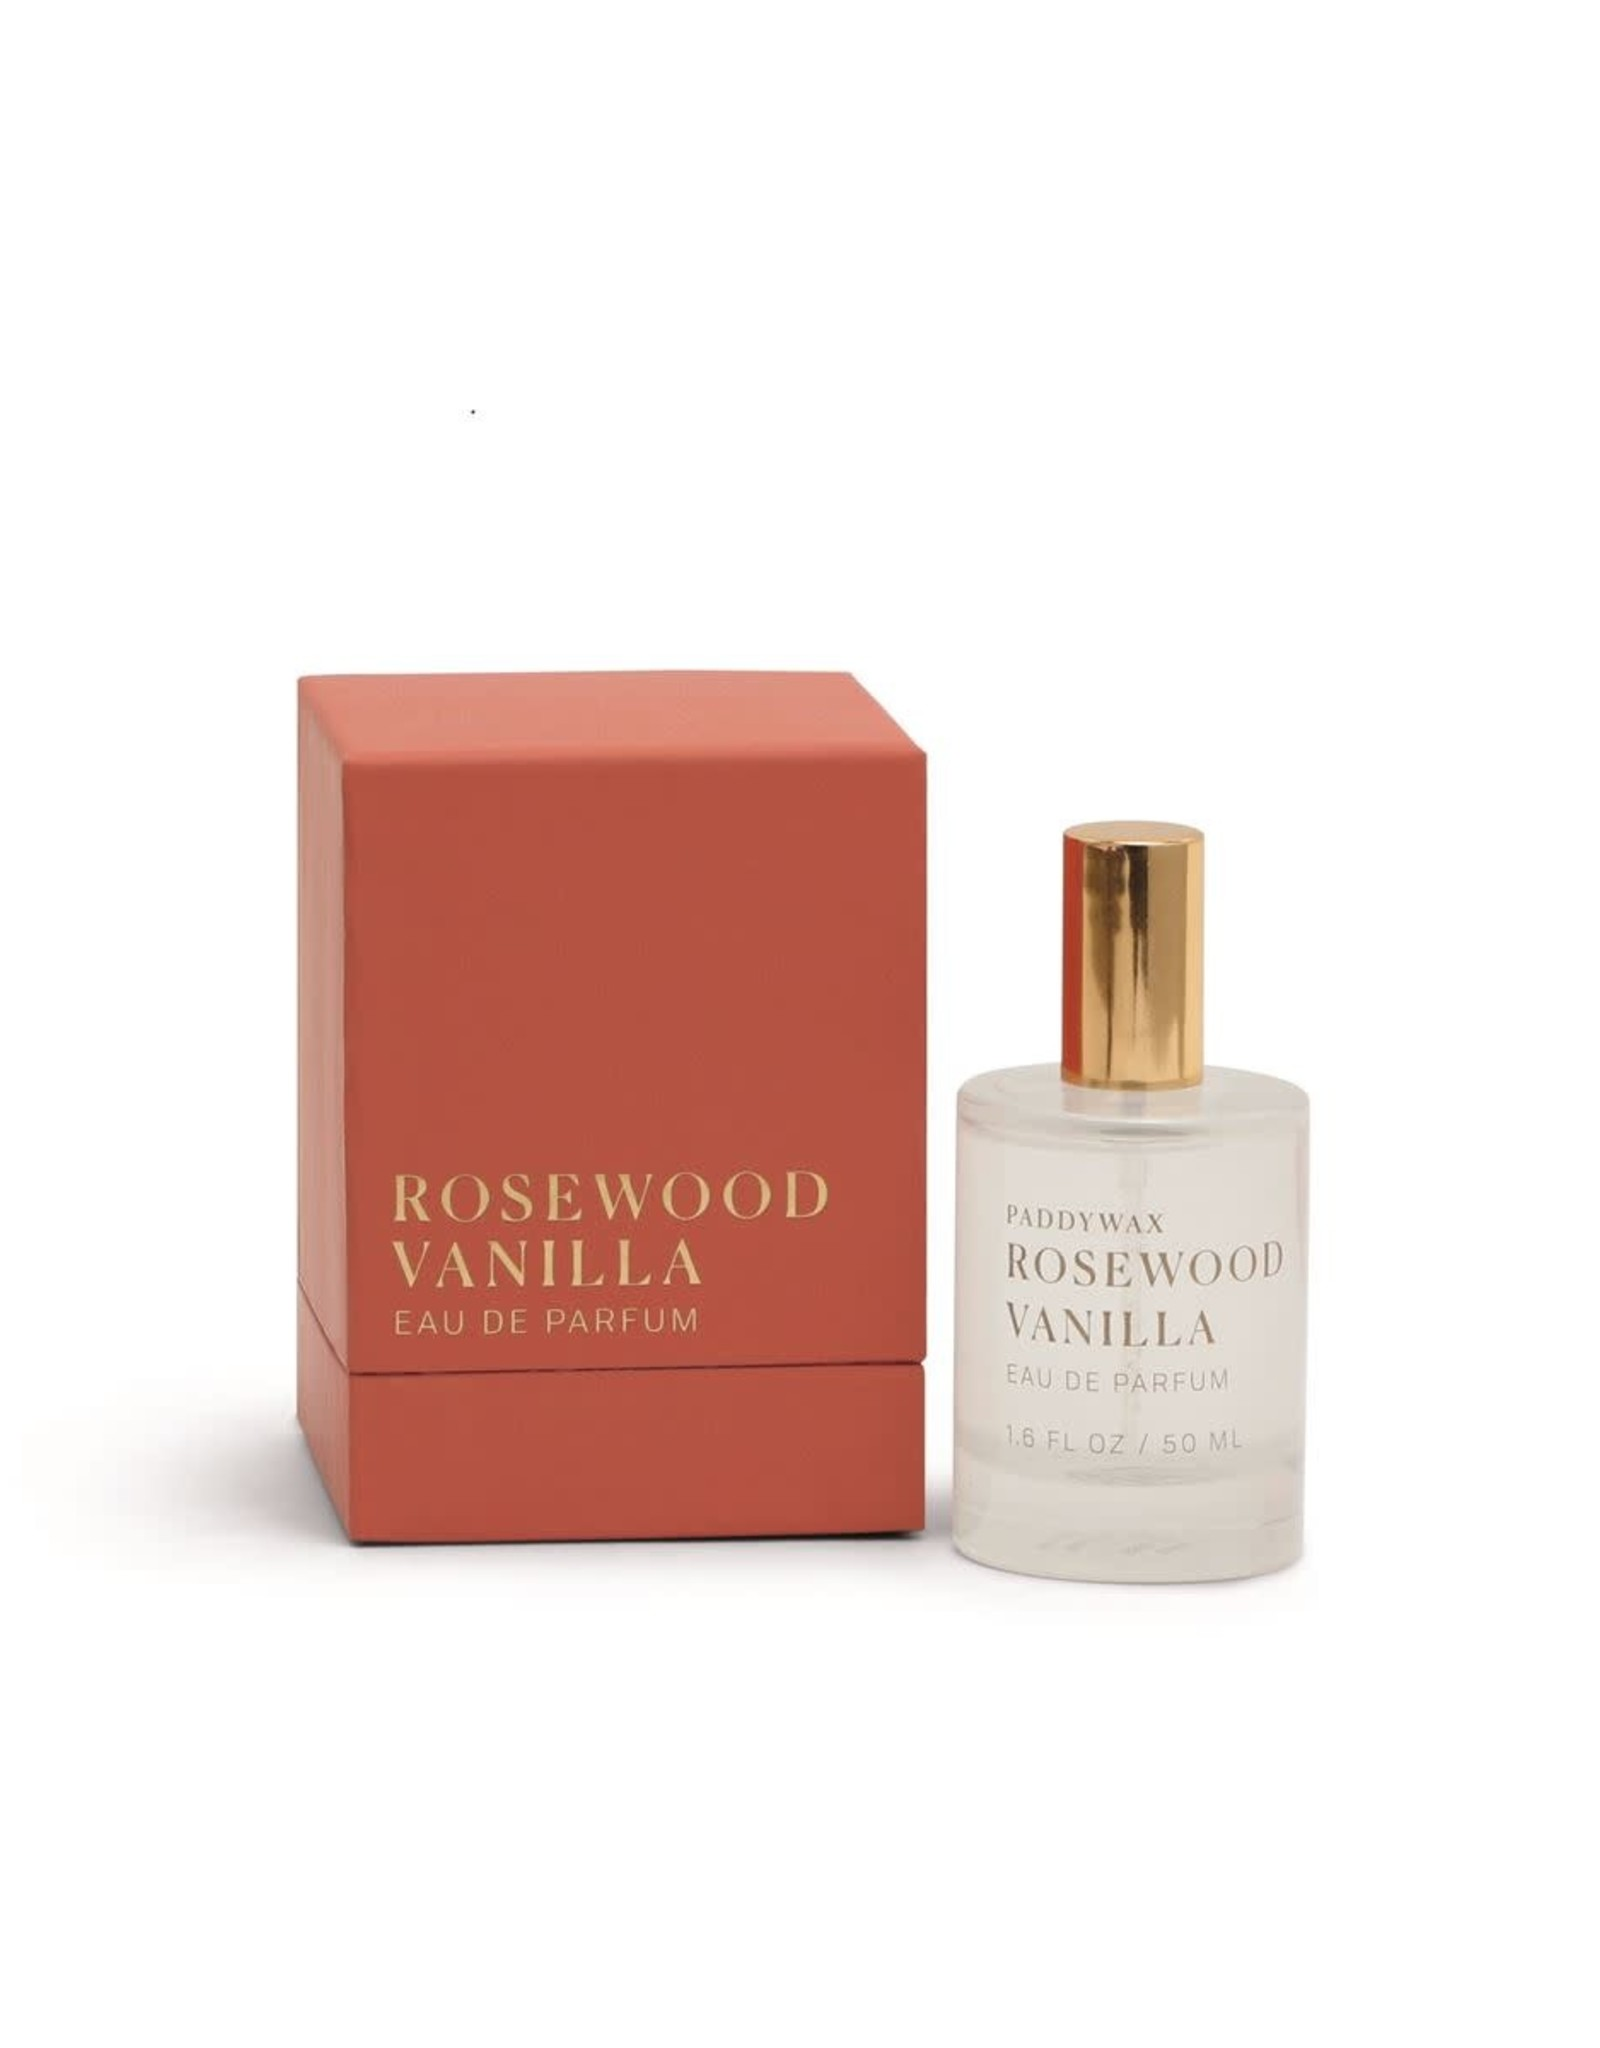 Rosewood Vanilla Perfume